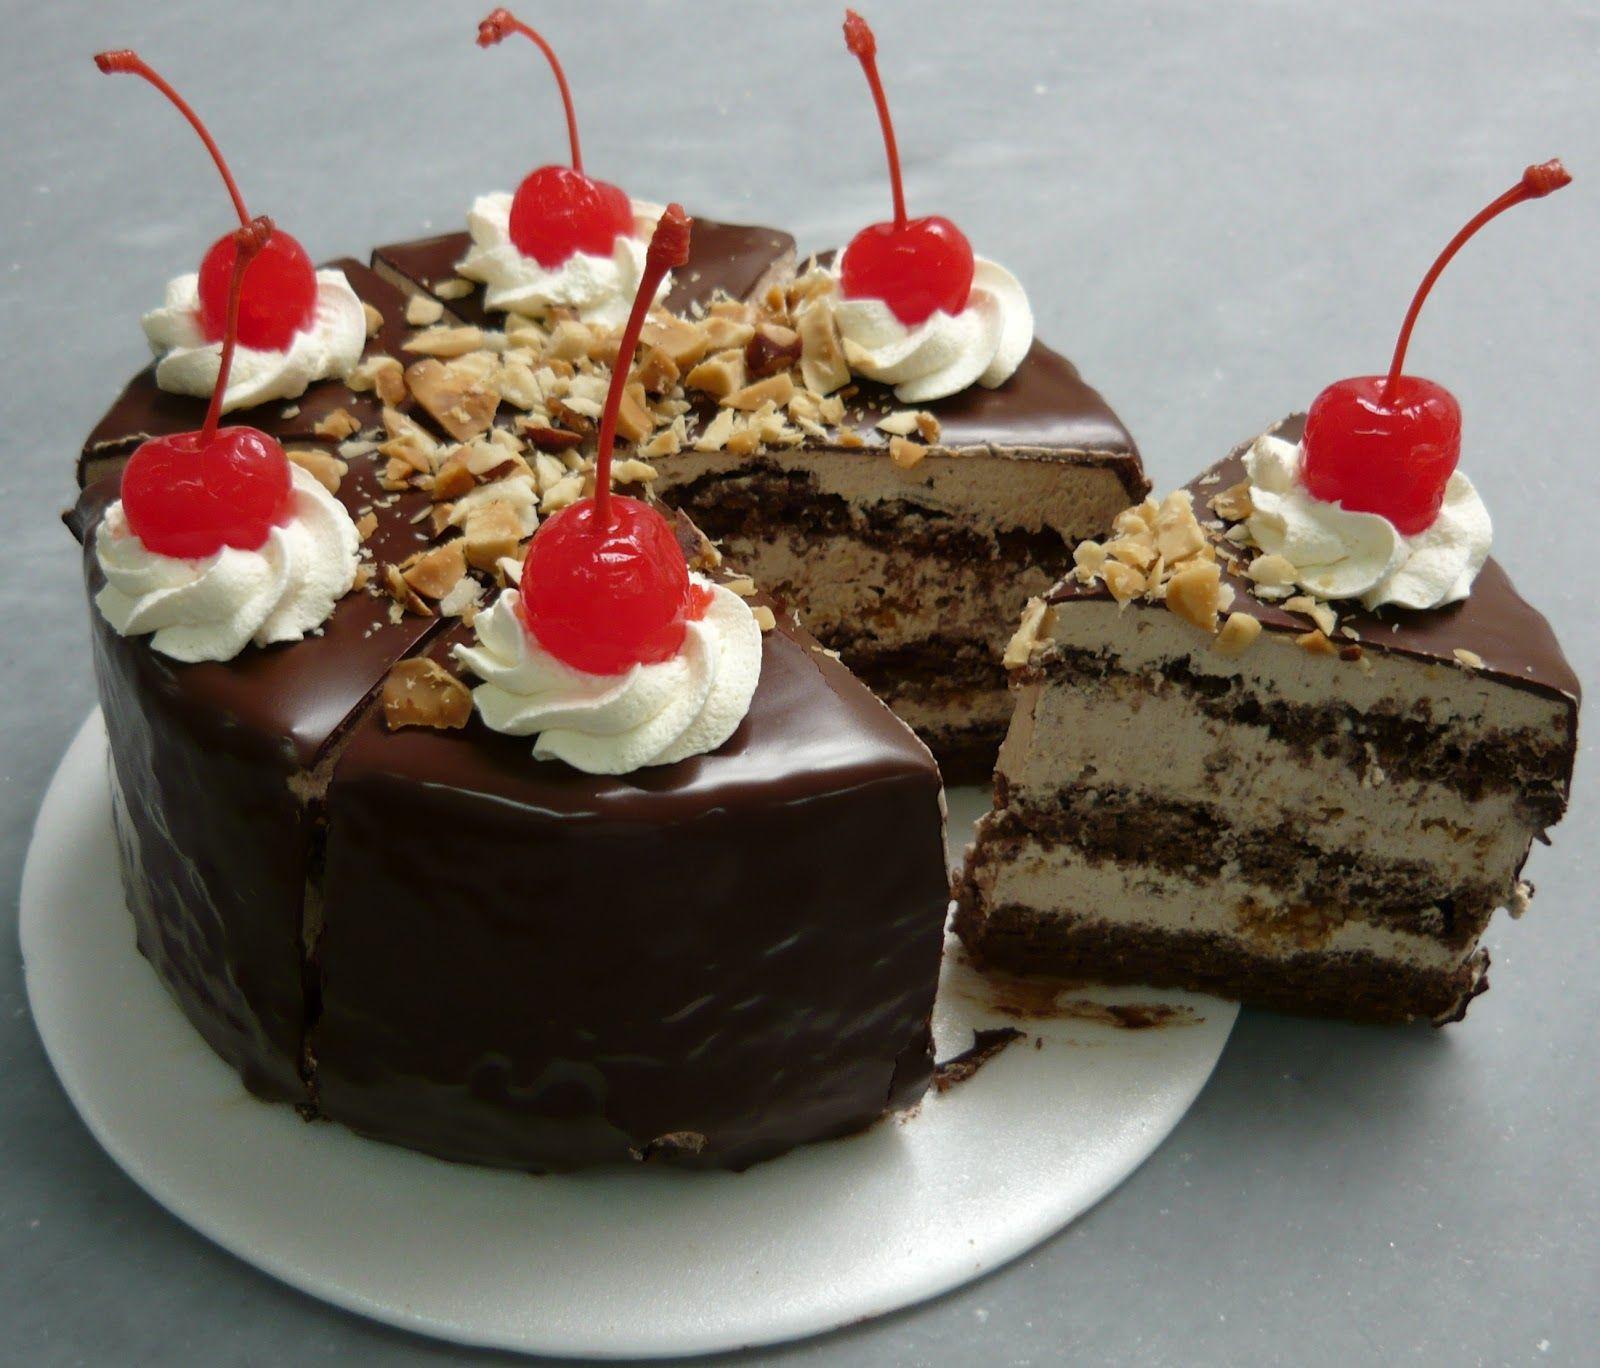 ambrossia tortas - Buscar con Google   Tortas   Pinterest   Searching